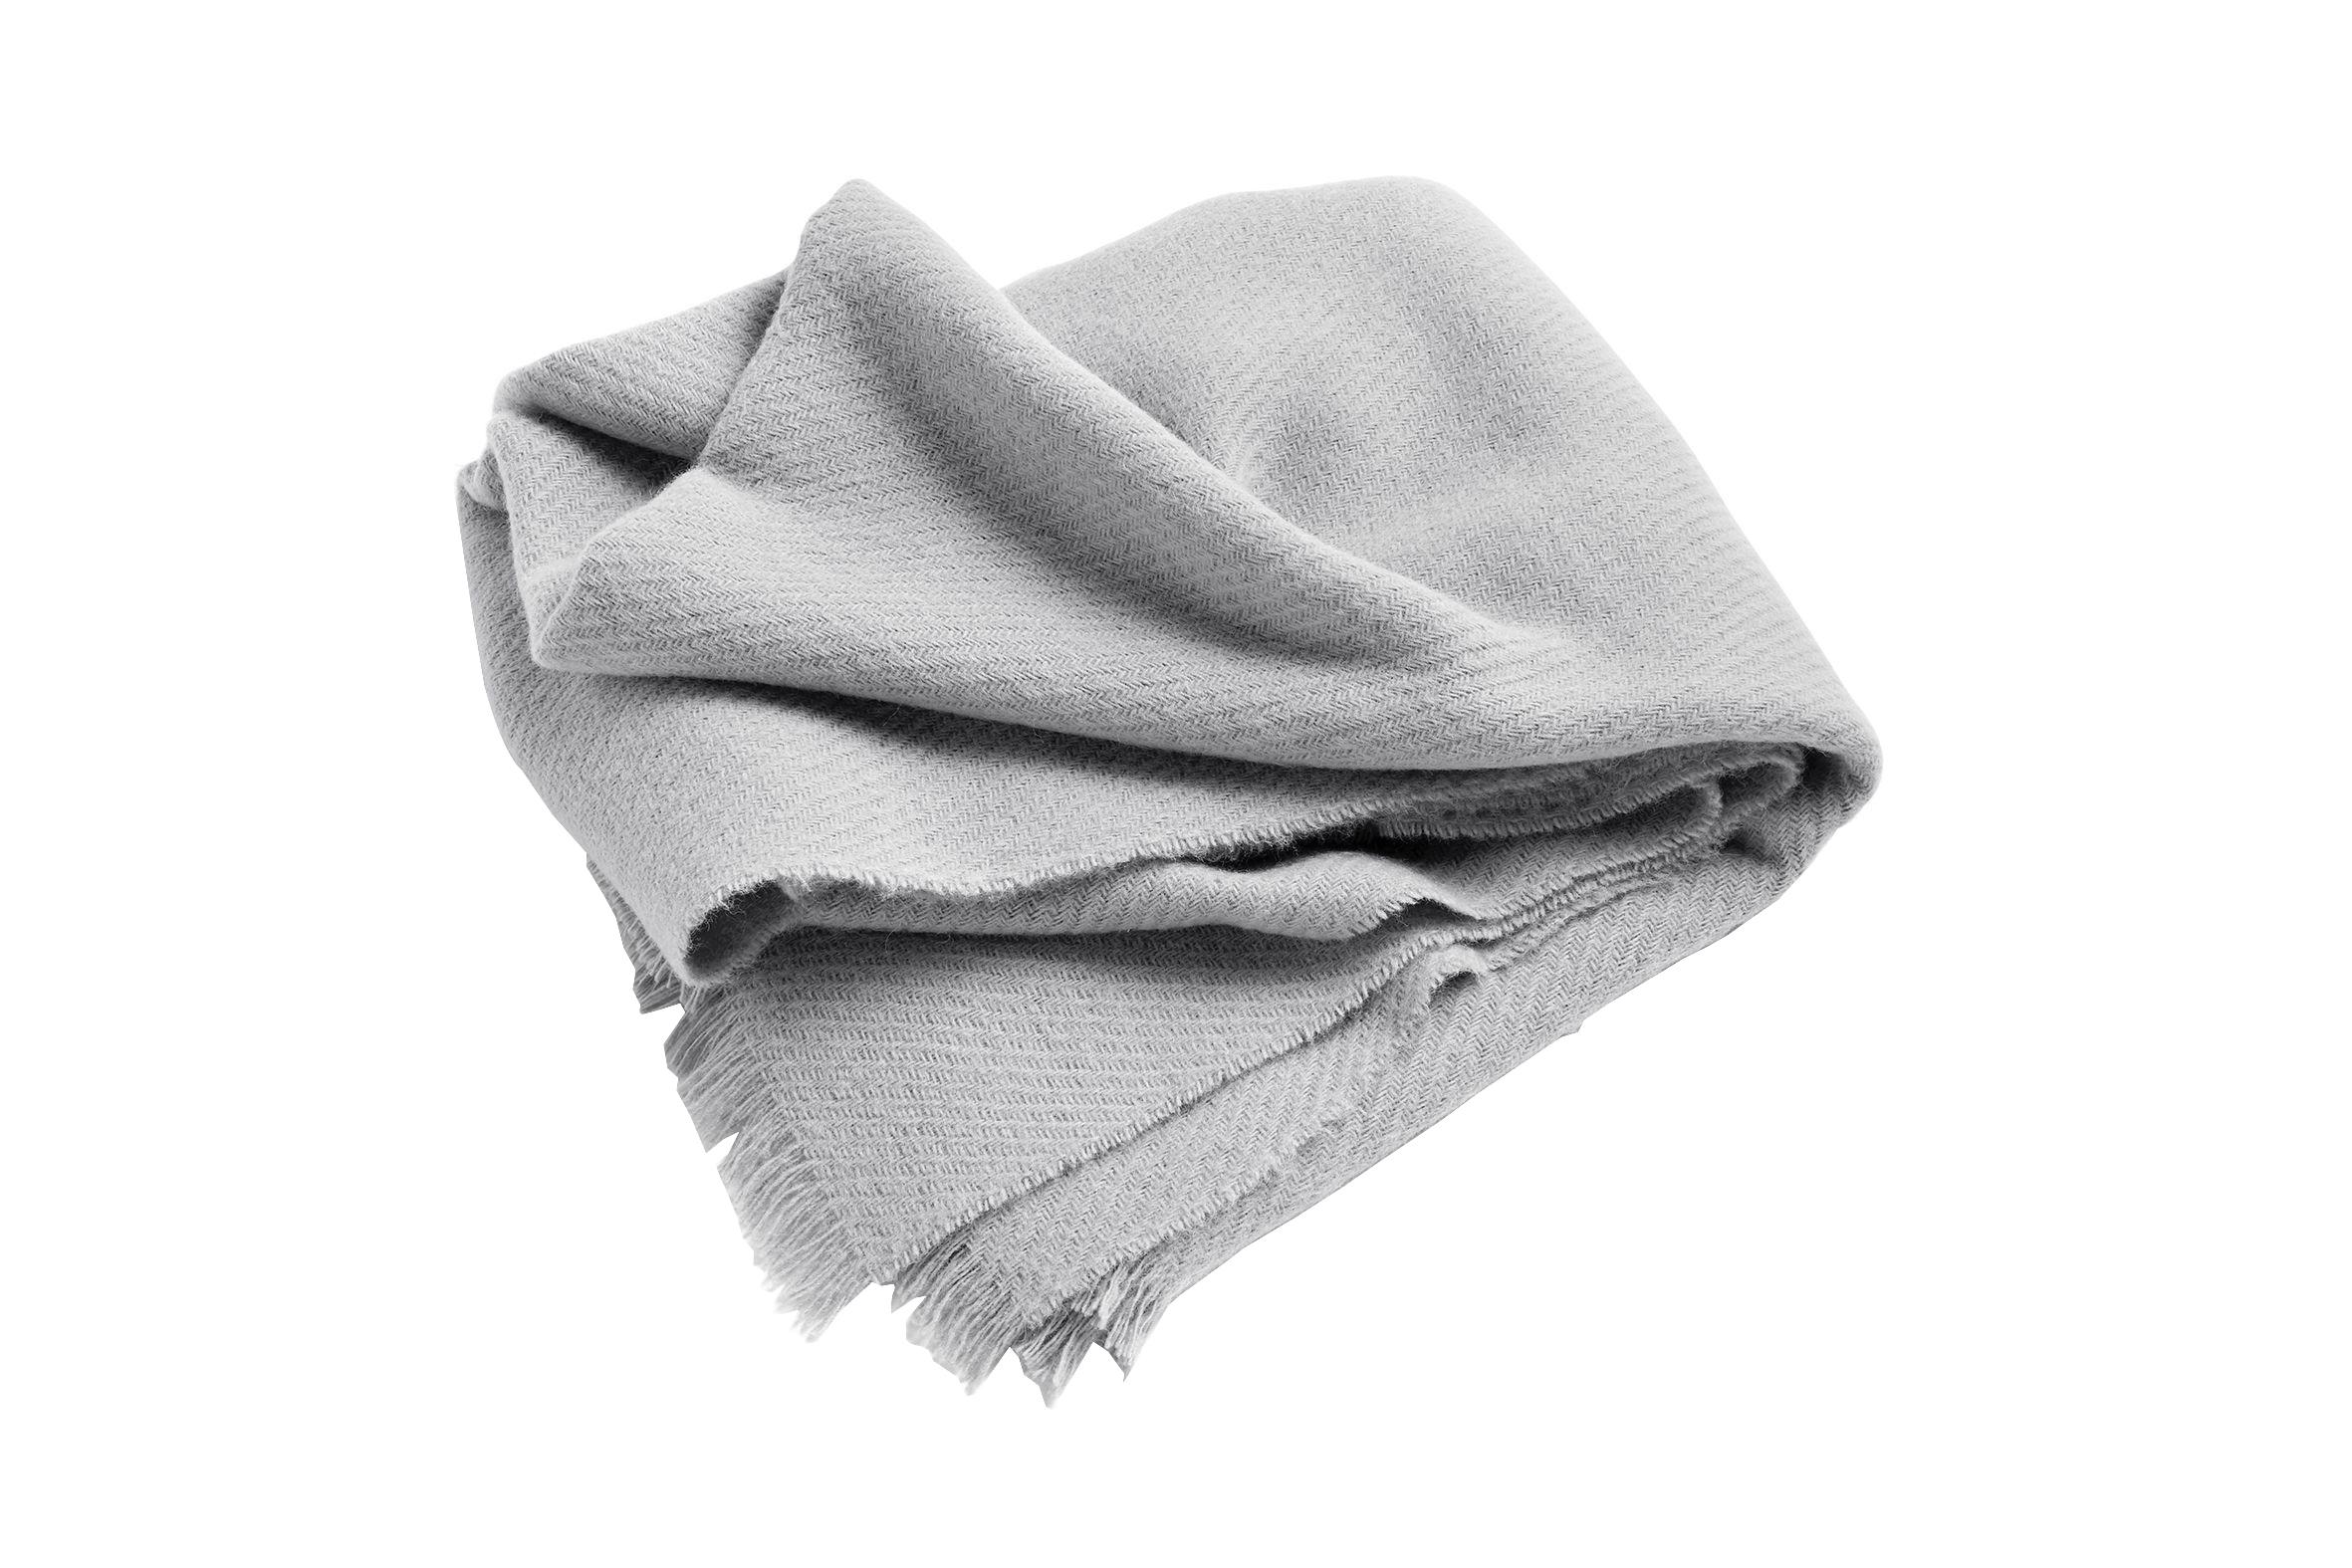 HAY - Mono Blanket 180 x 130 cm - Fog (507541)